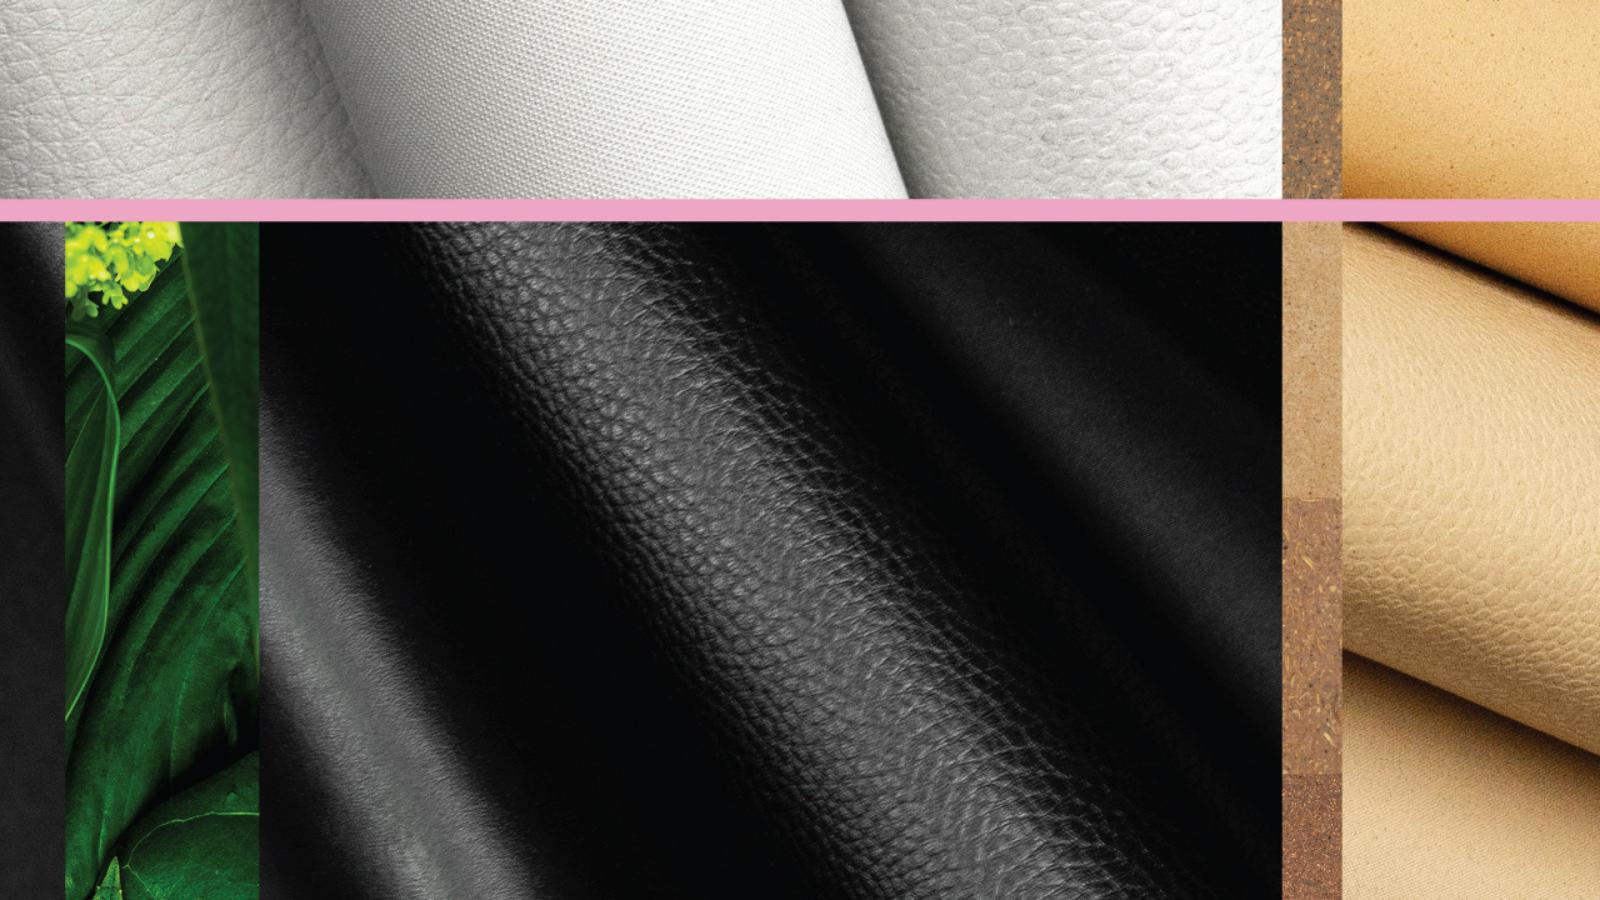 MIRUM sheets in black tan off white